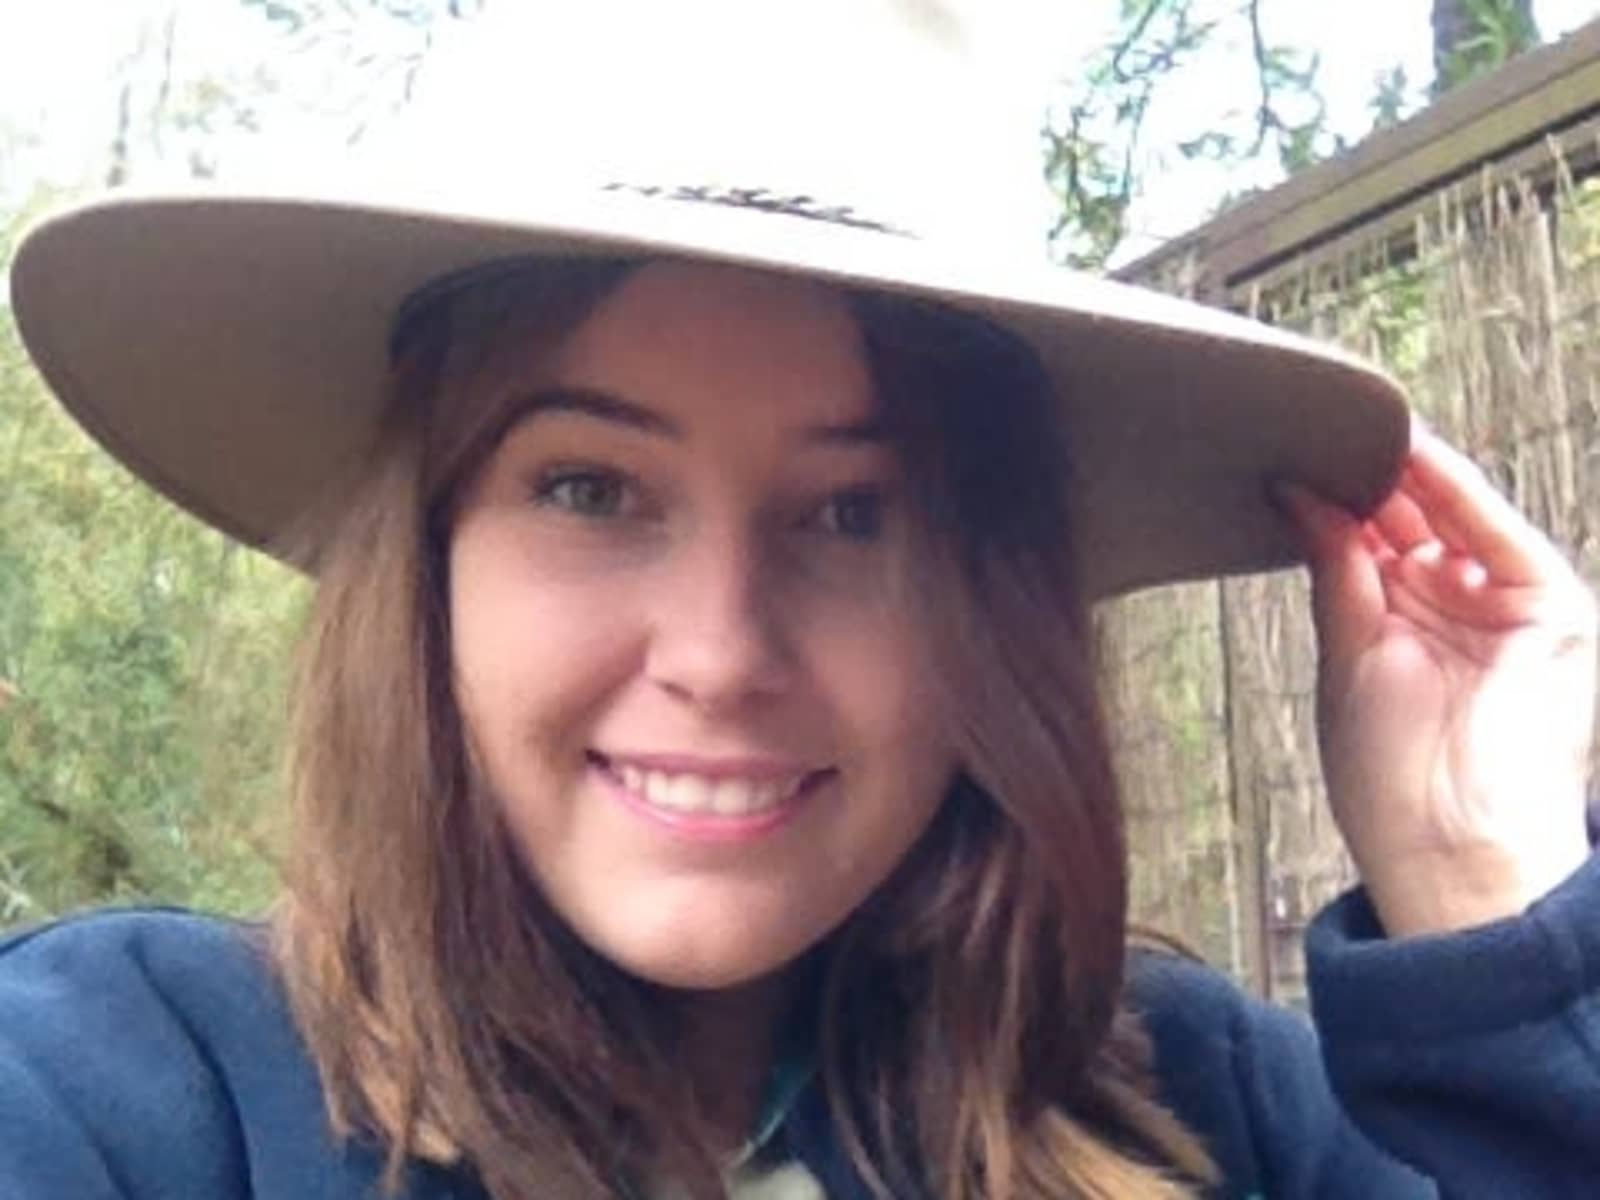 Lauren from Melbourne, Victoria, Australia